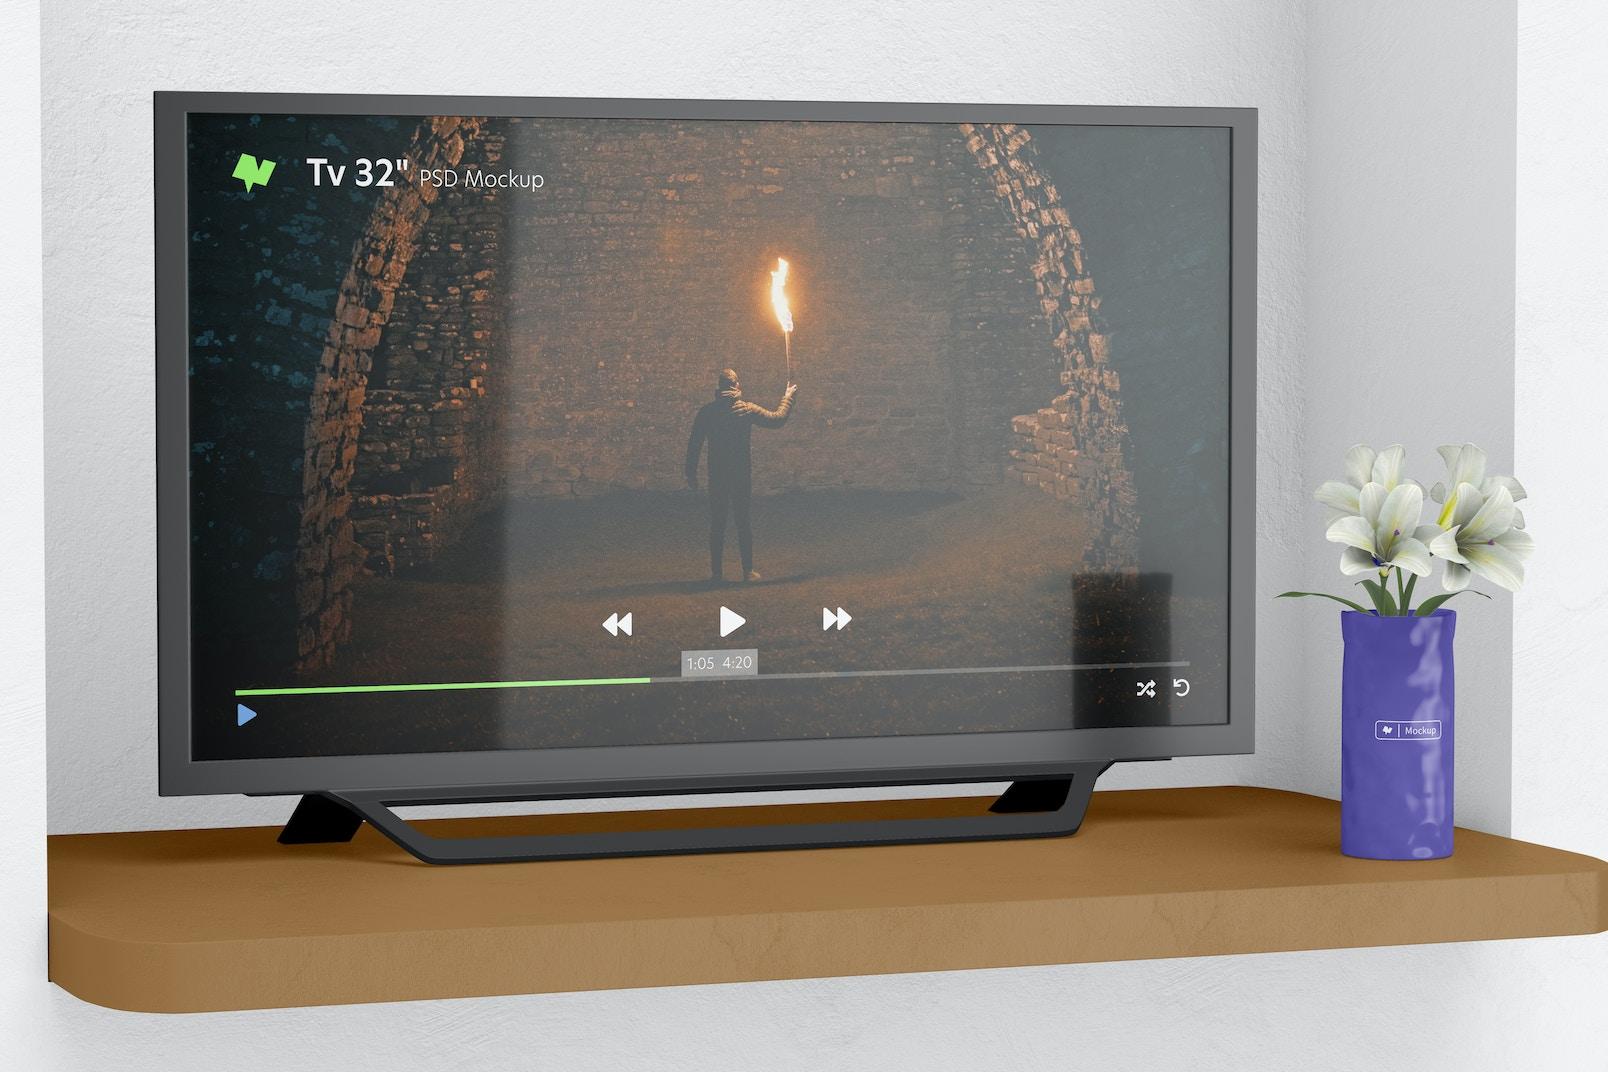 "Tv 32"" on a Shelf Mockup"